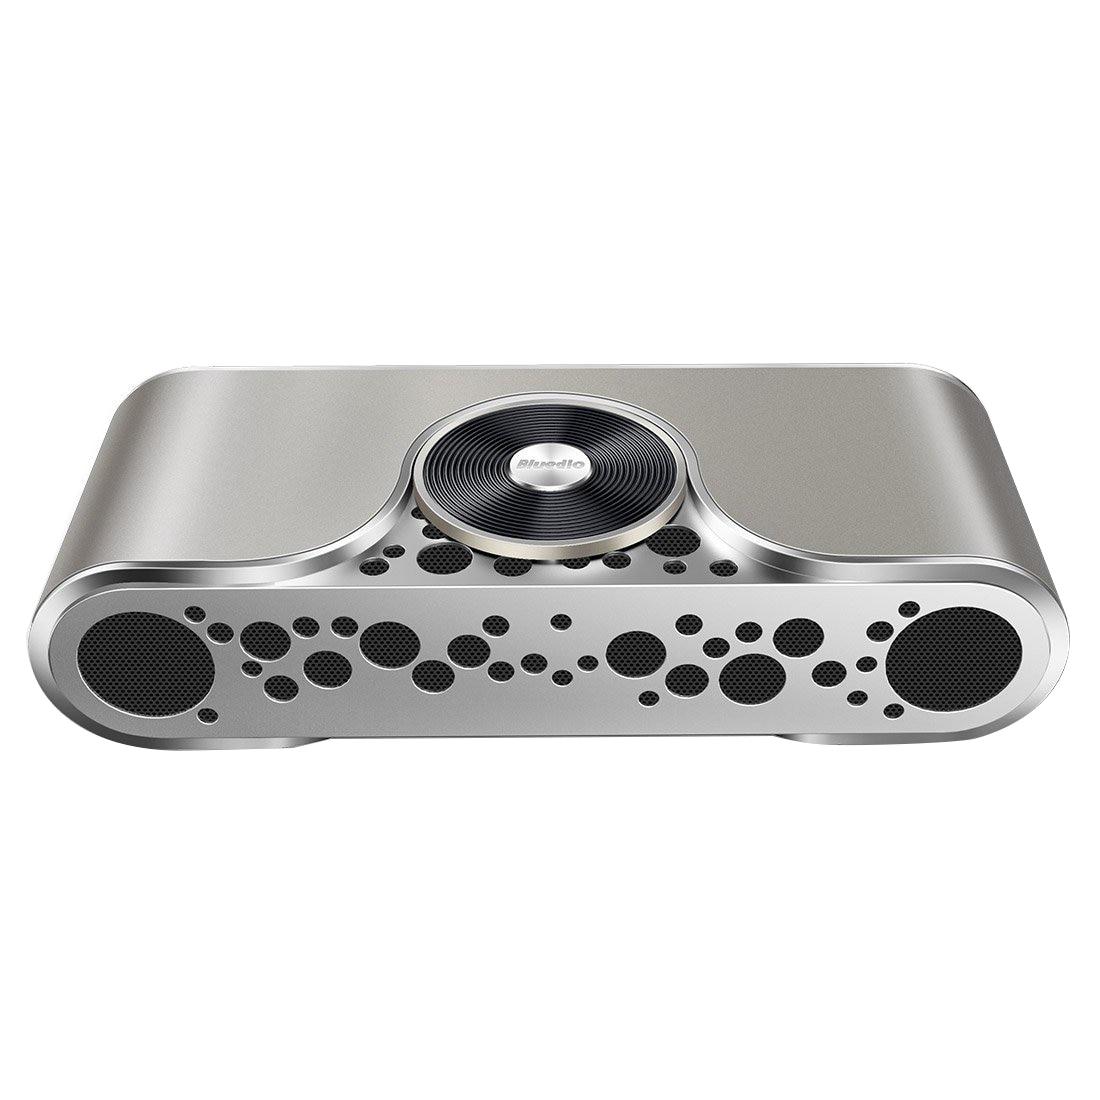 Bluedio TS-3(Turbine) 2.1 Channel Wireless Bluetooth Speaker with Micro SD Card Slot(Gold)